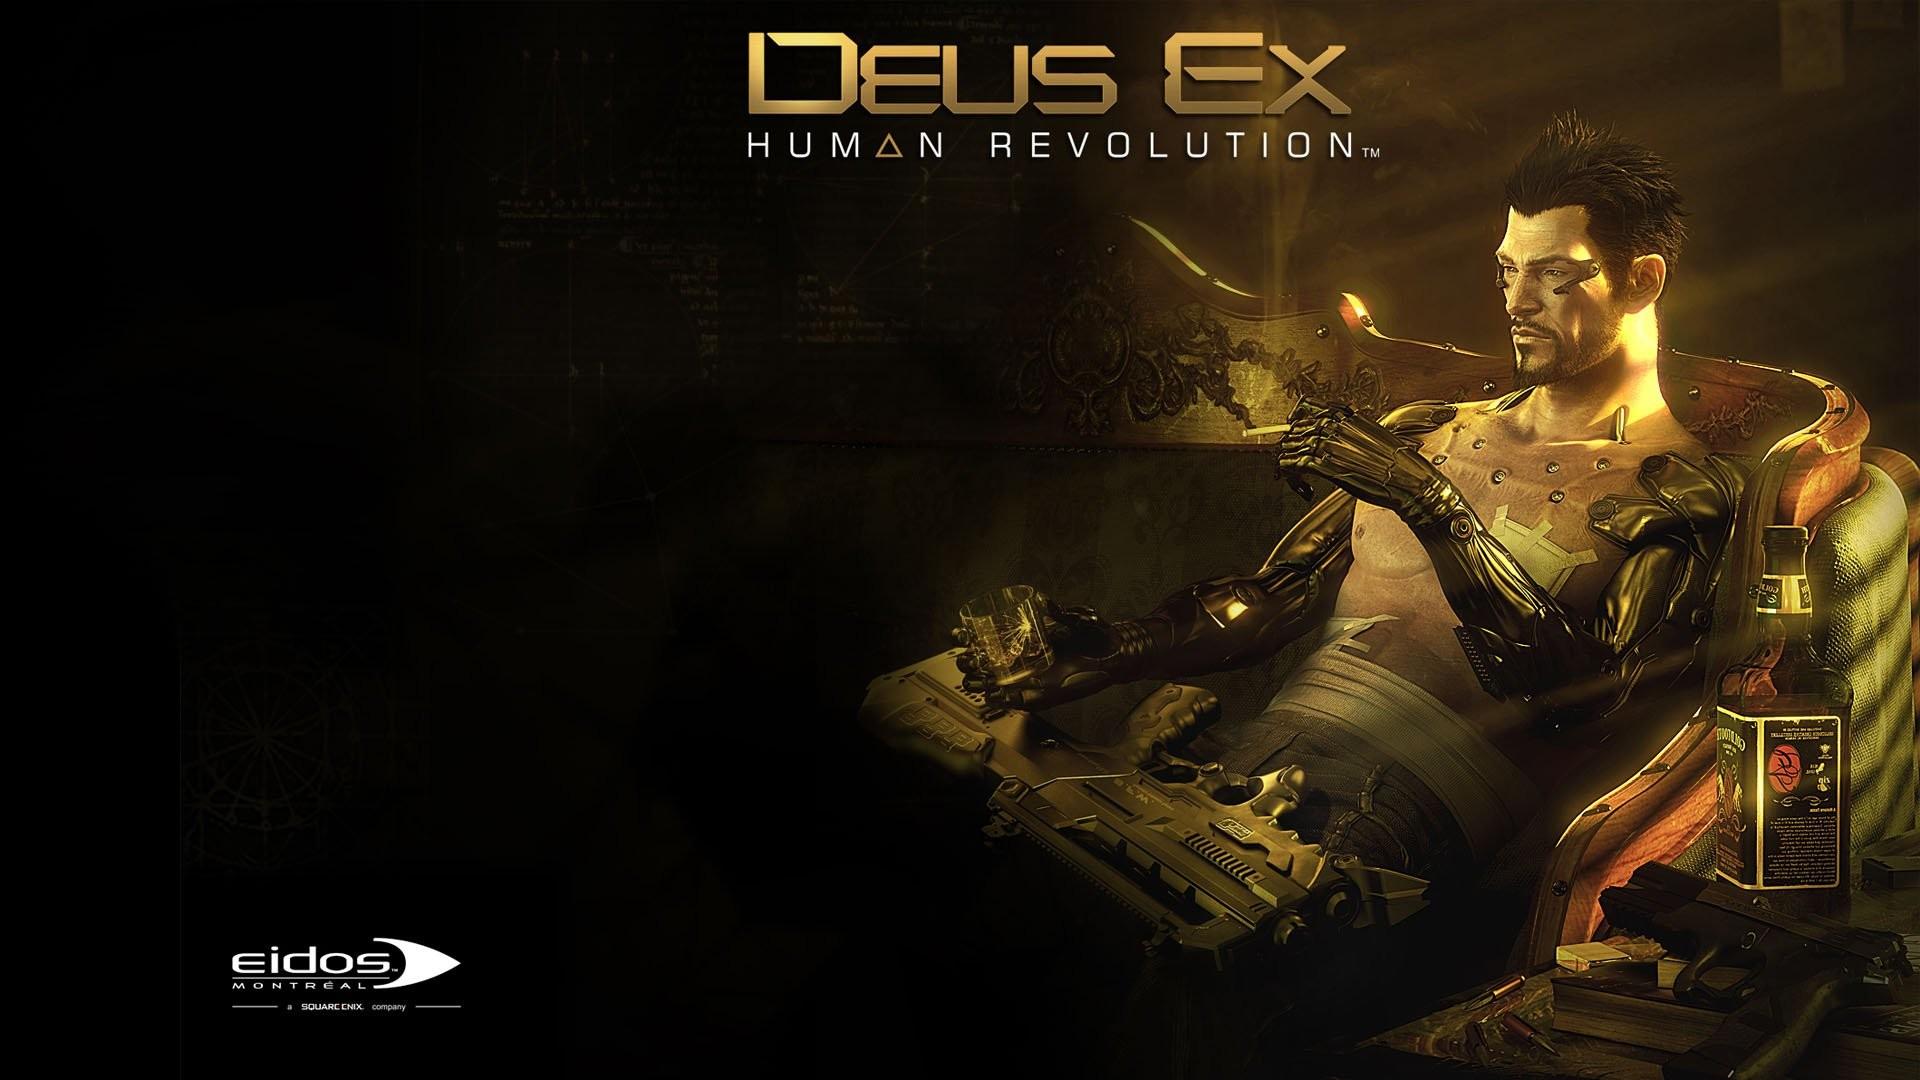 Deus ex wallpapers 77 images 1920x1200 video game deus ex human revolution wallpaper voltagebd Choice Image